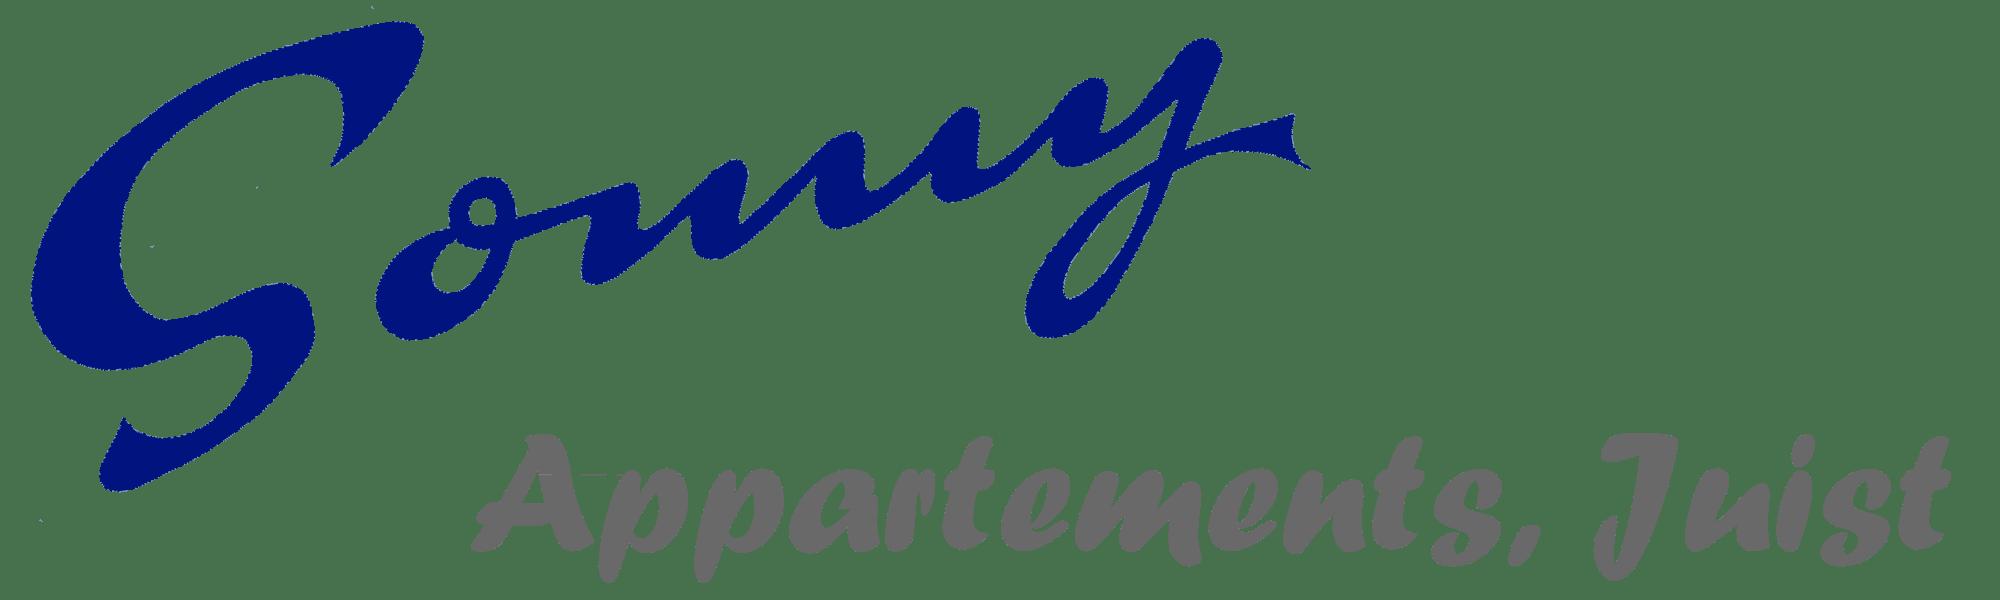 Sonny Appartements, Juist Logo